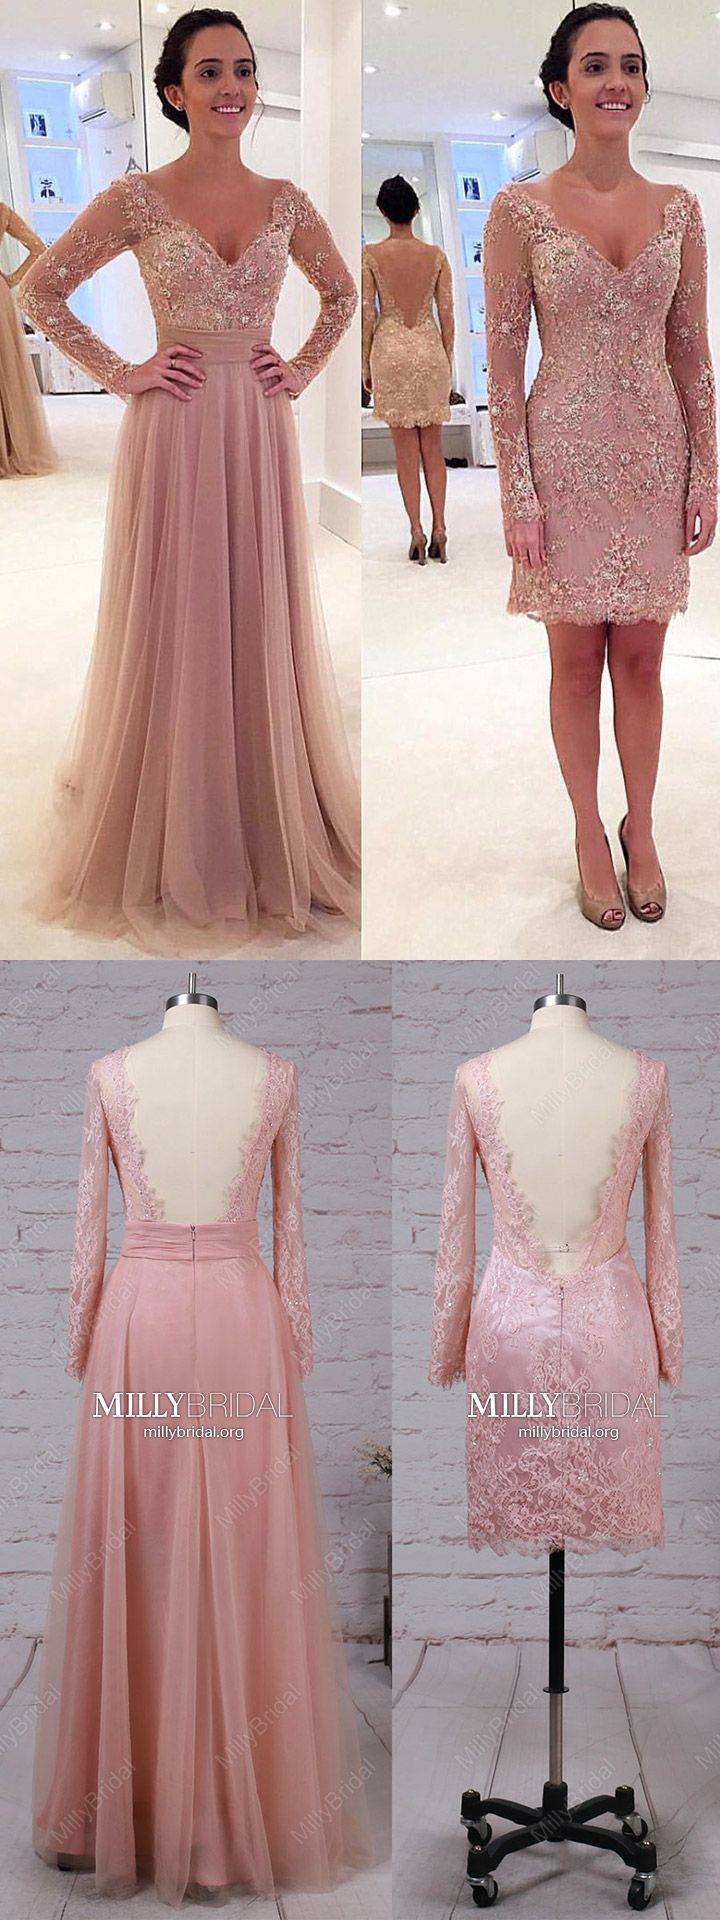 best prom dresses with slit images on pinterest